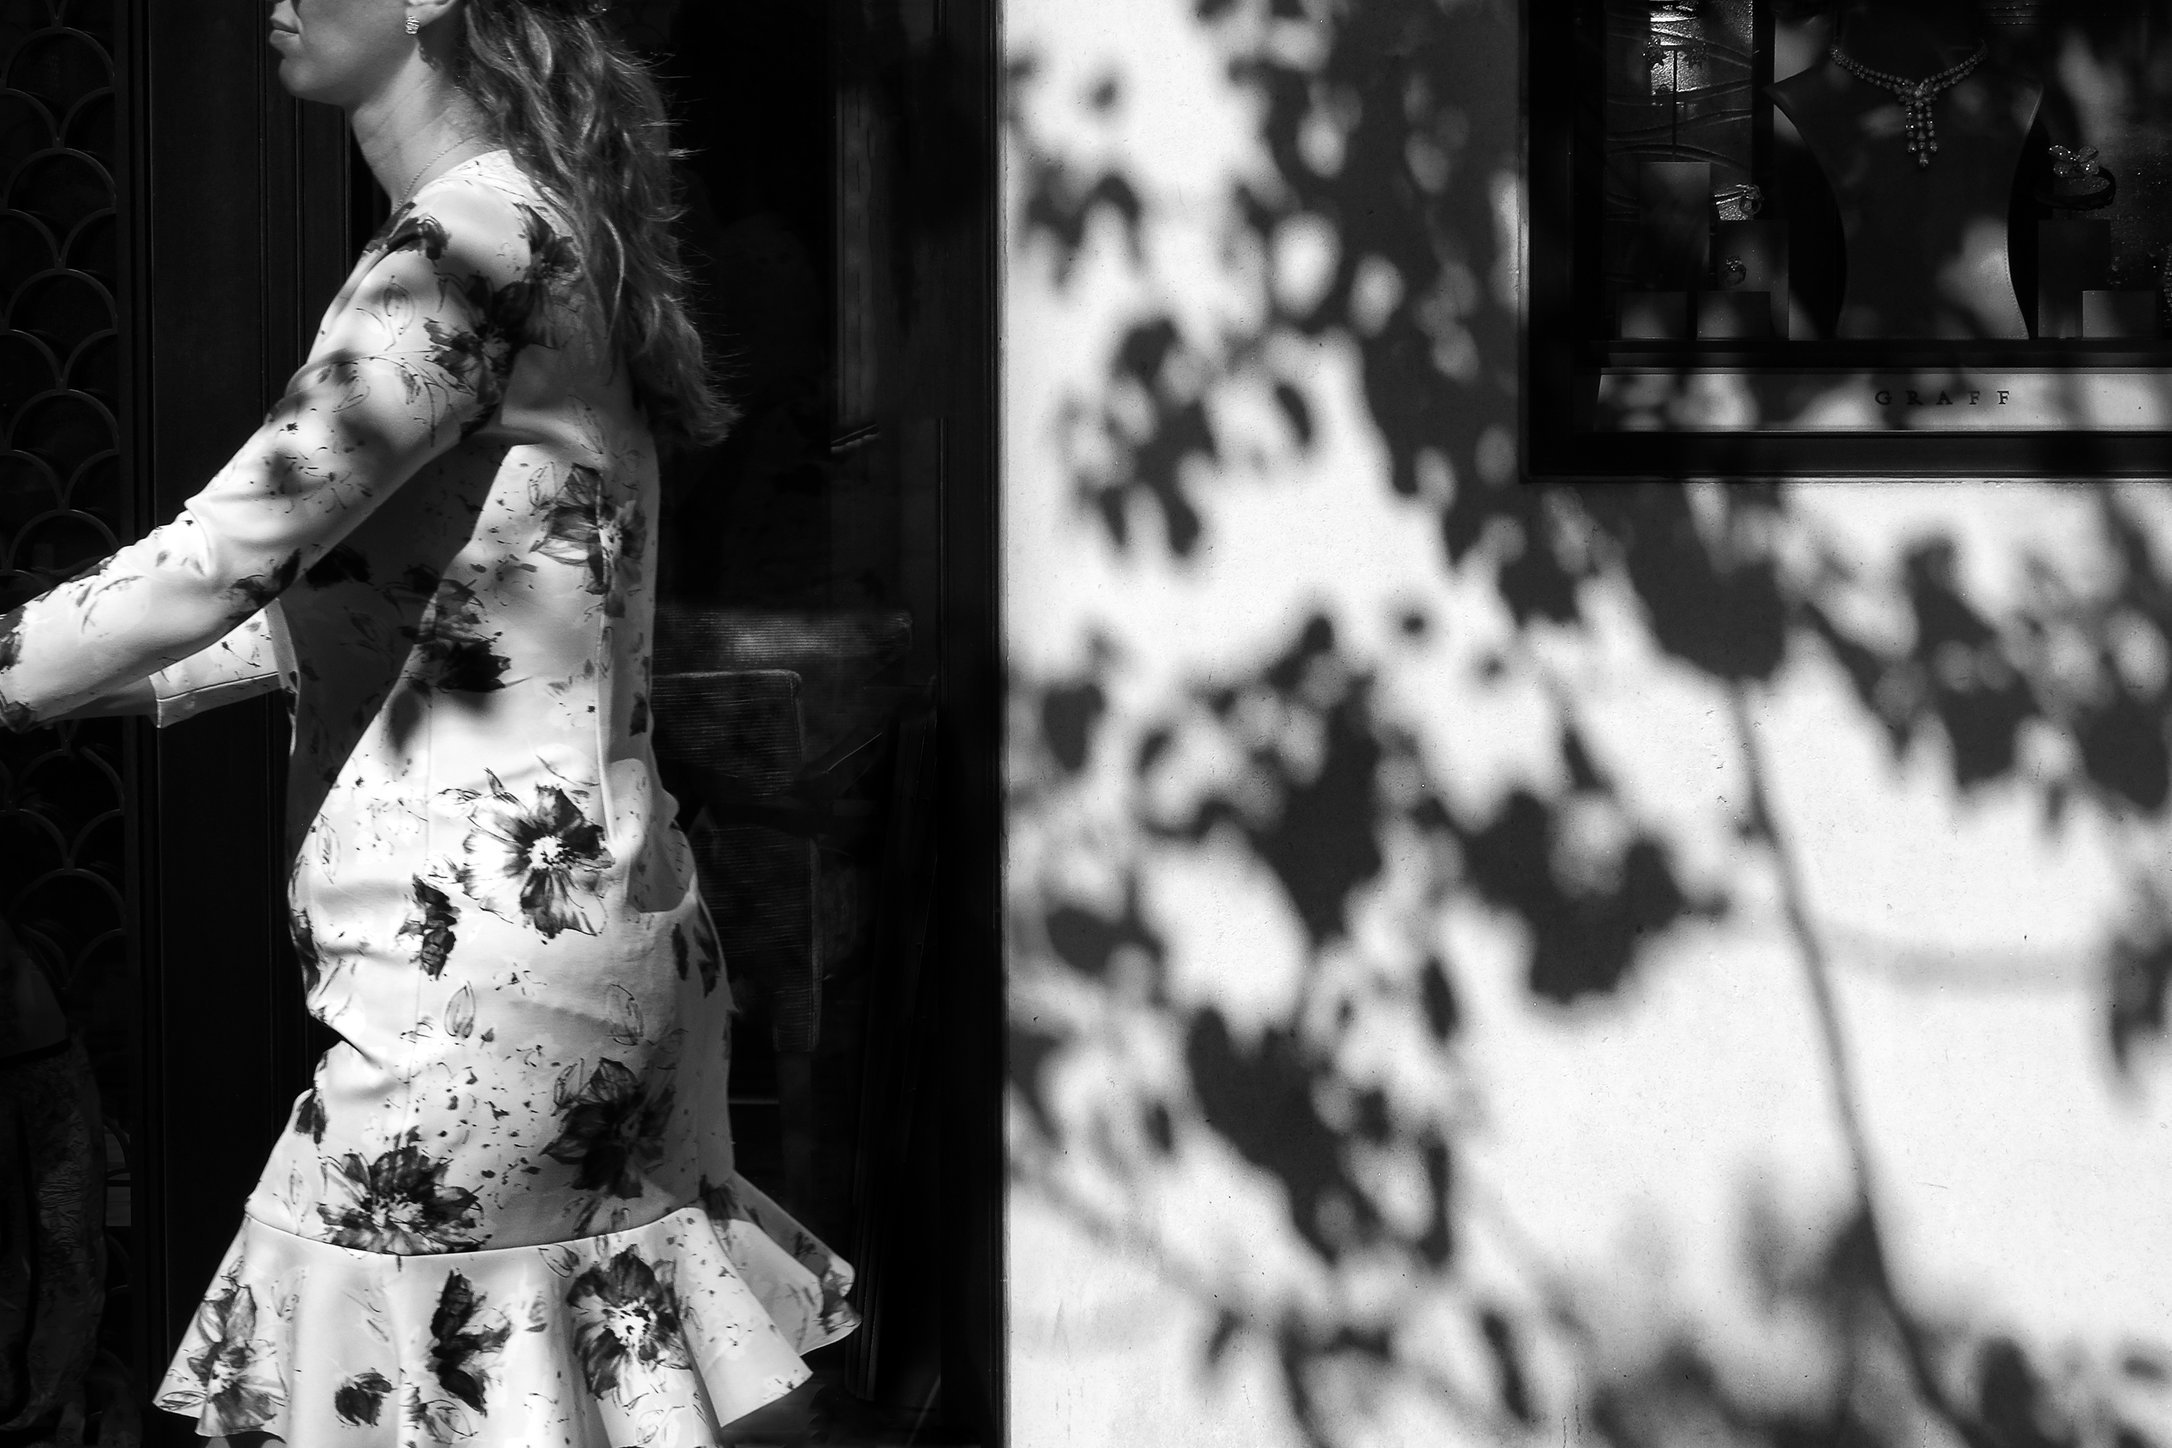 dress-and-tree.jpg